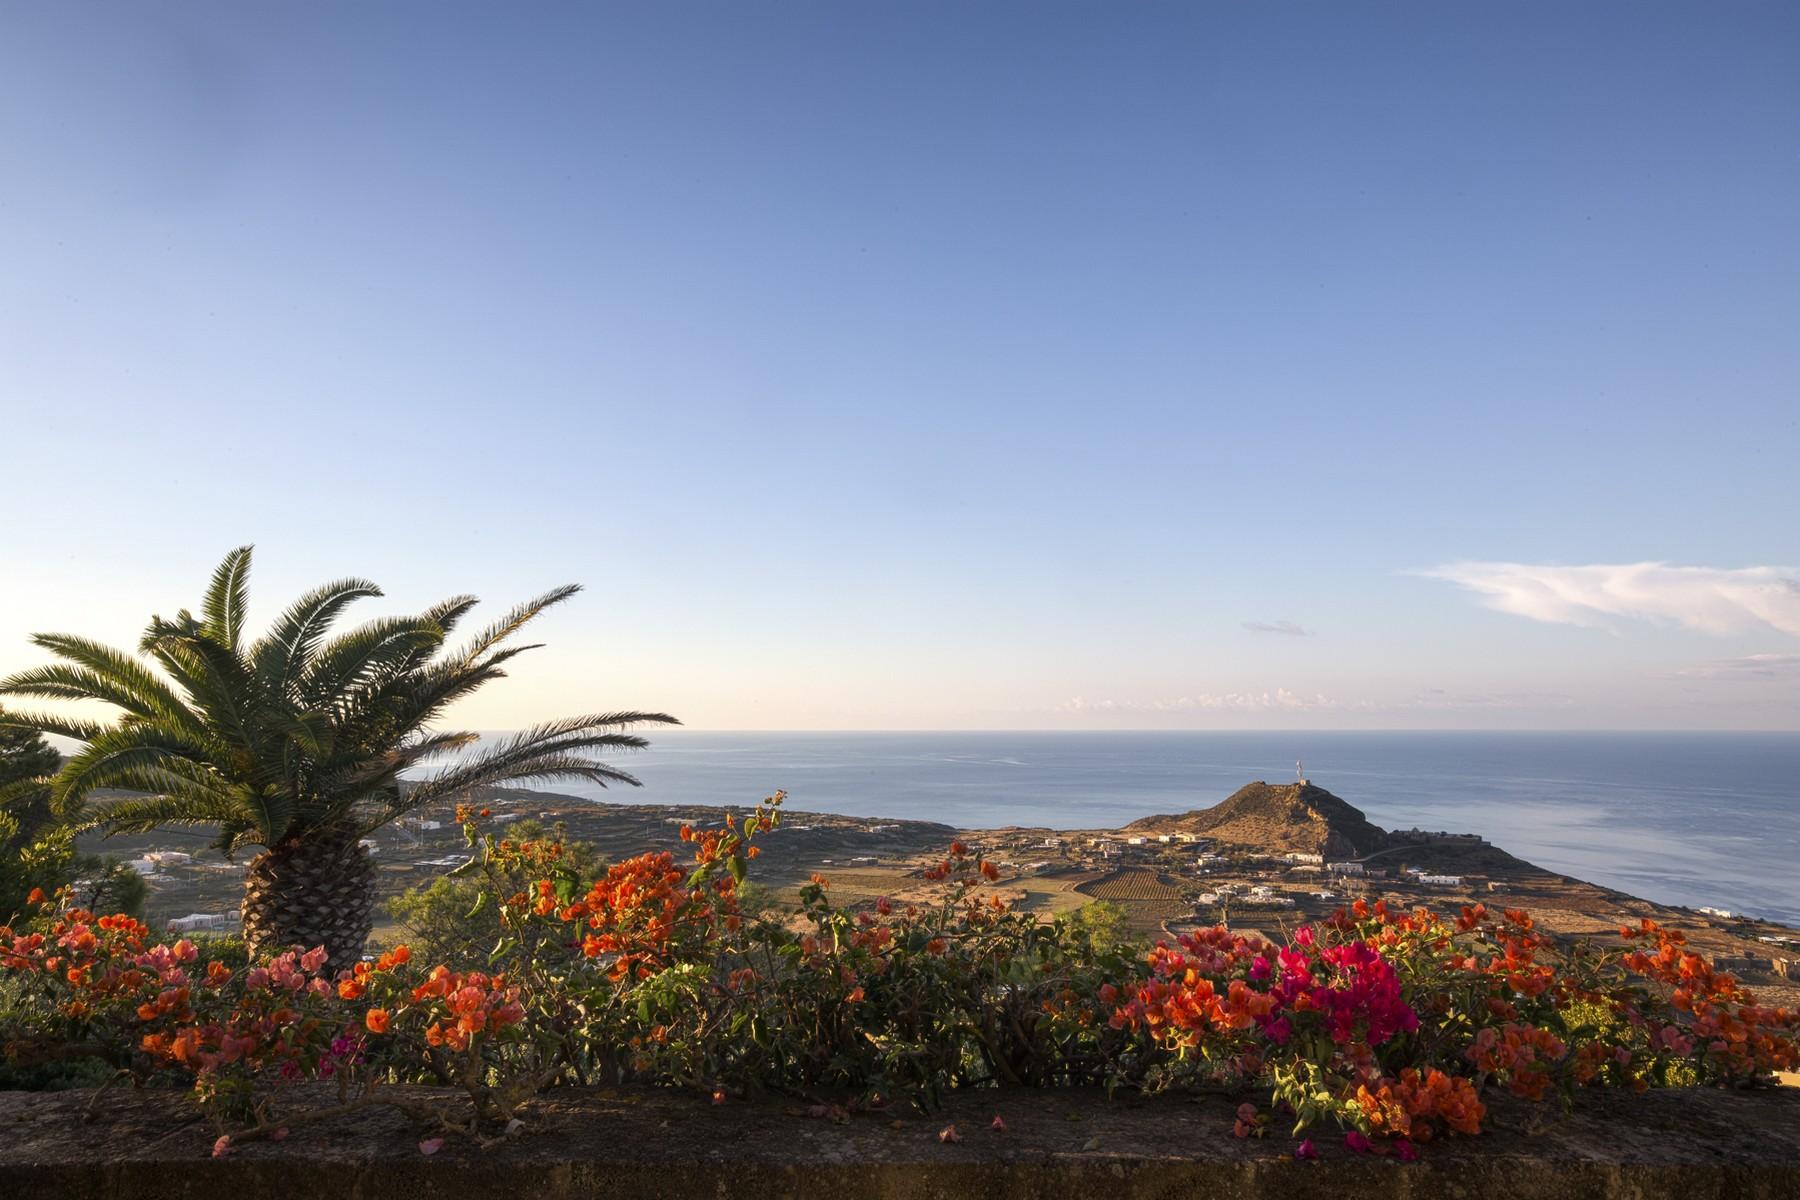 Villa in Vendita a Pantelleria: 5 locali, 530 mq - Foto 23